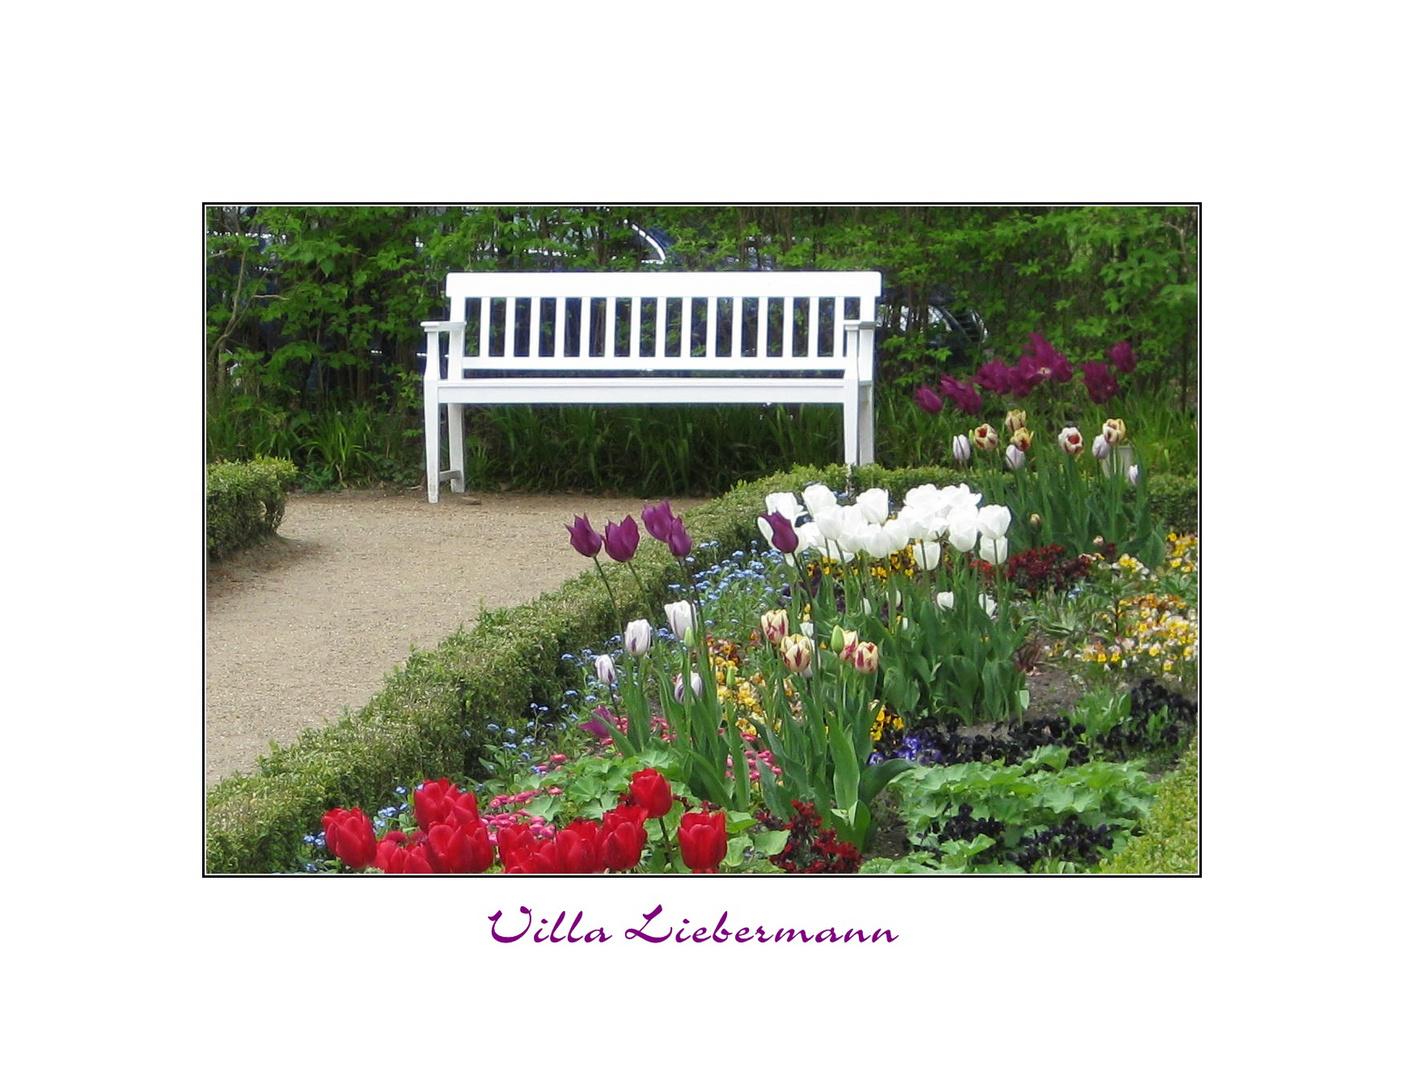 Frühling in der Villa Liebermann III